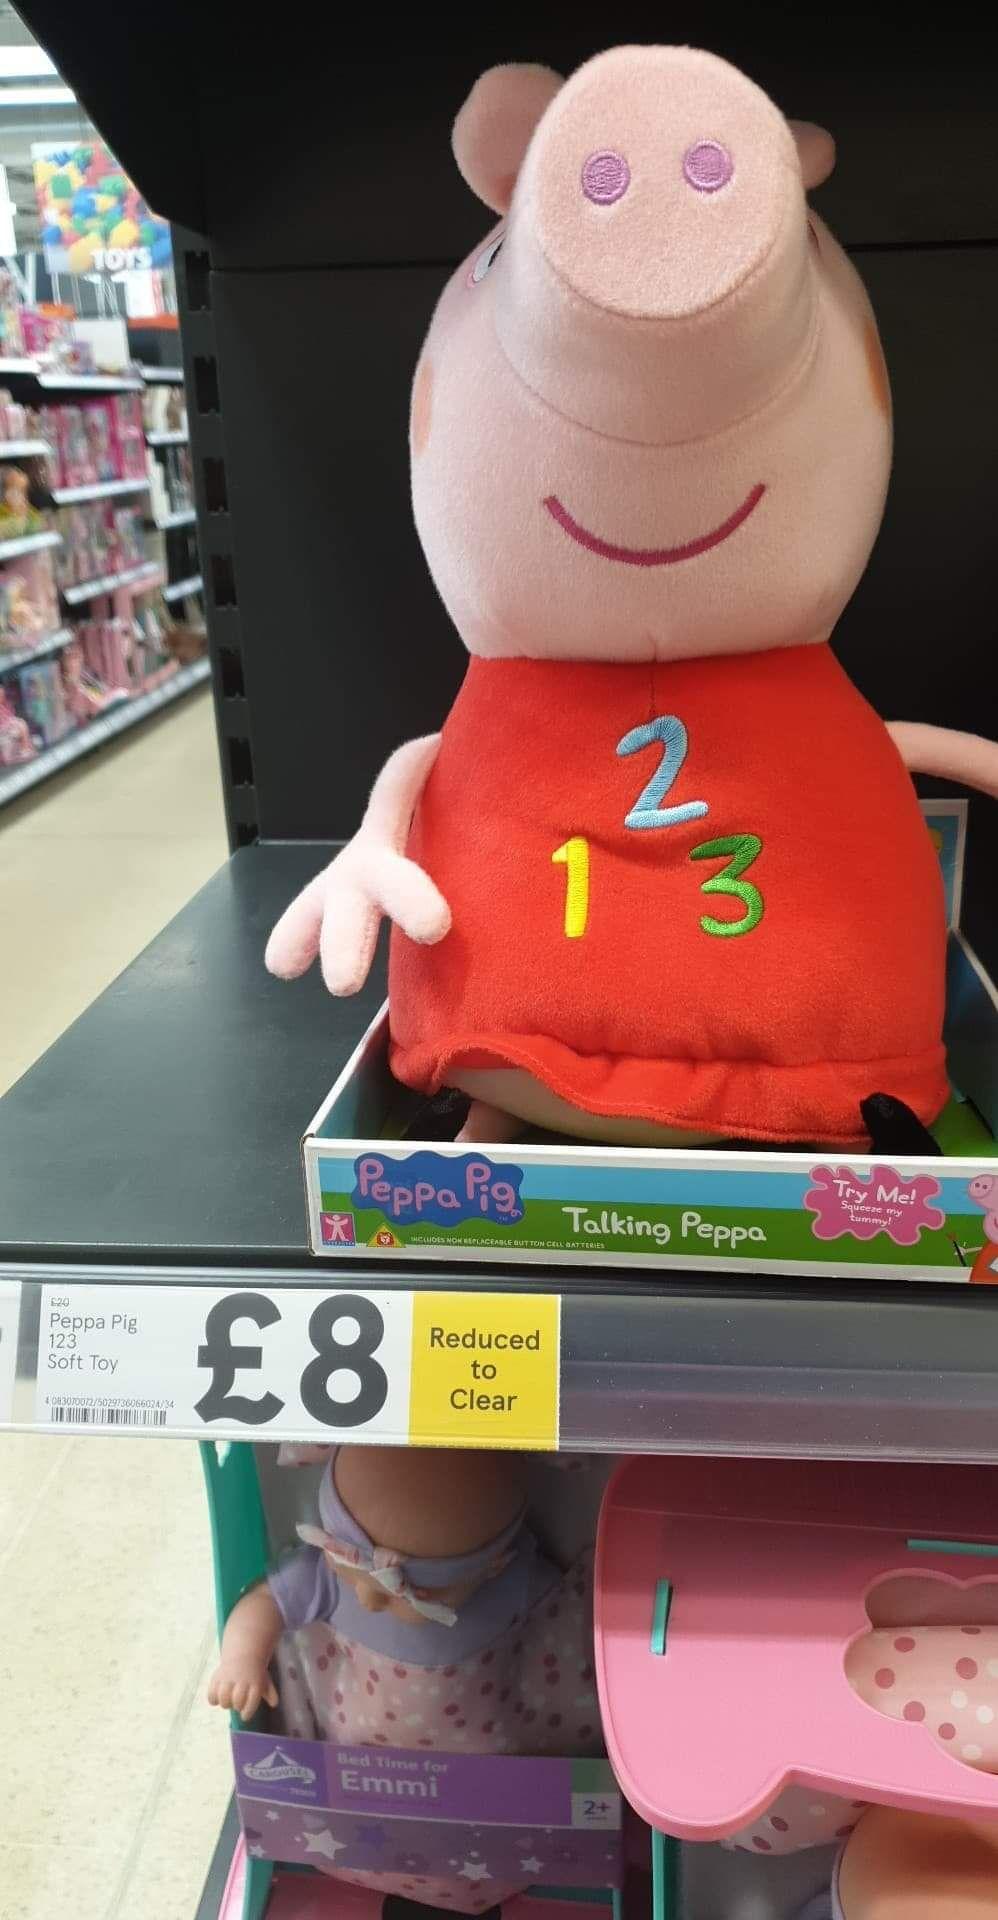 Talking Peppa - £8 Instore @ Tesco (Rotherham)